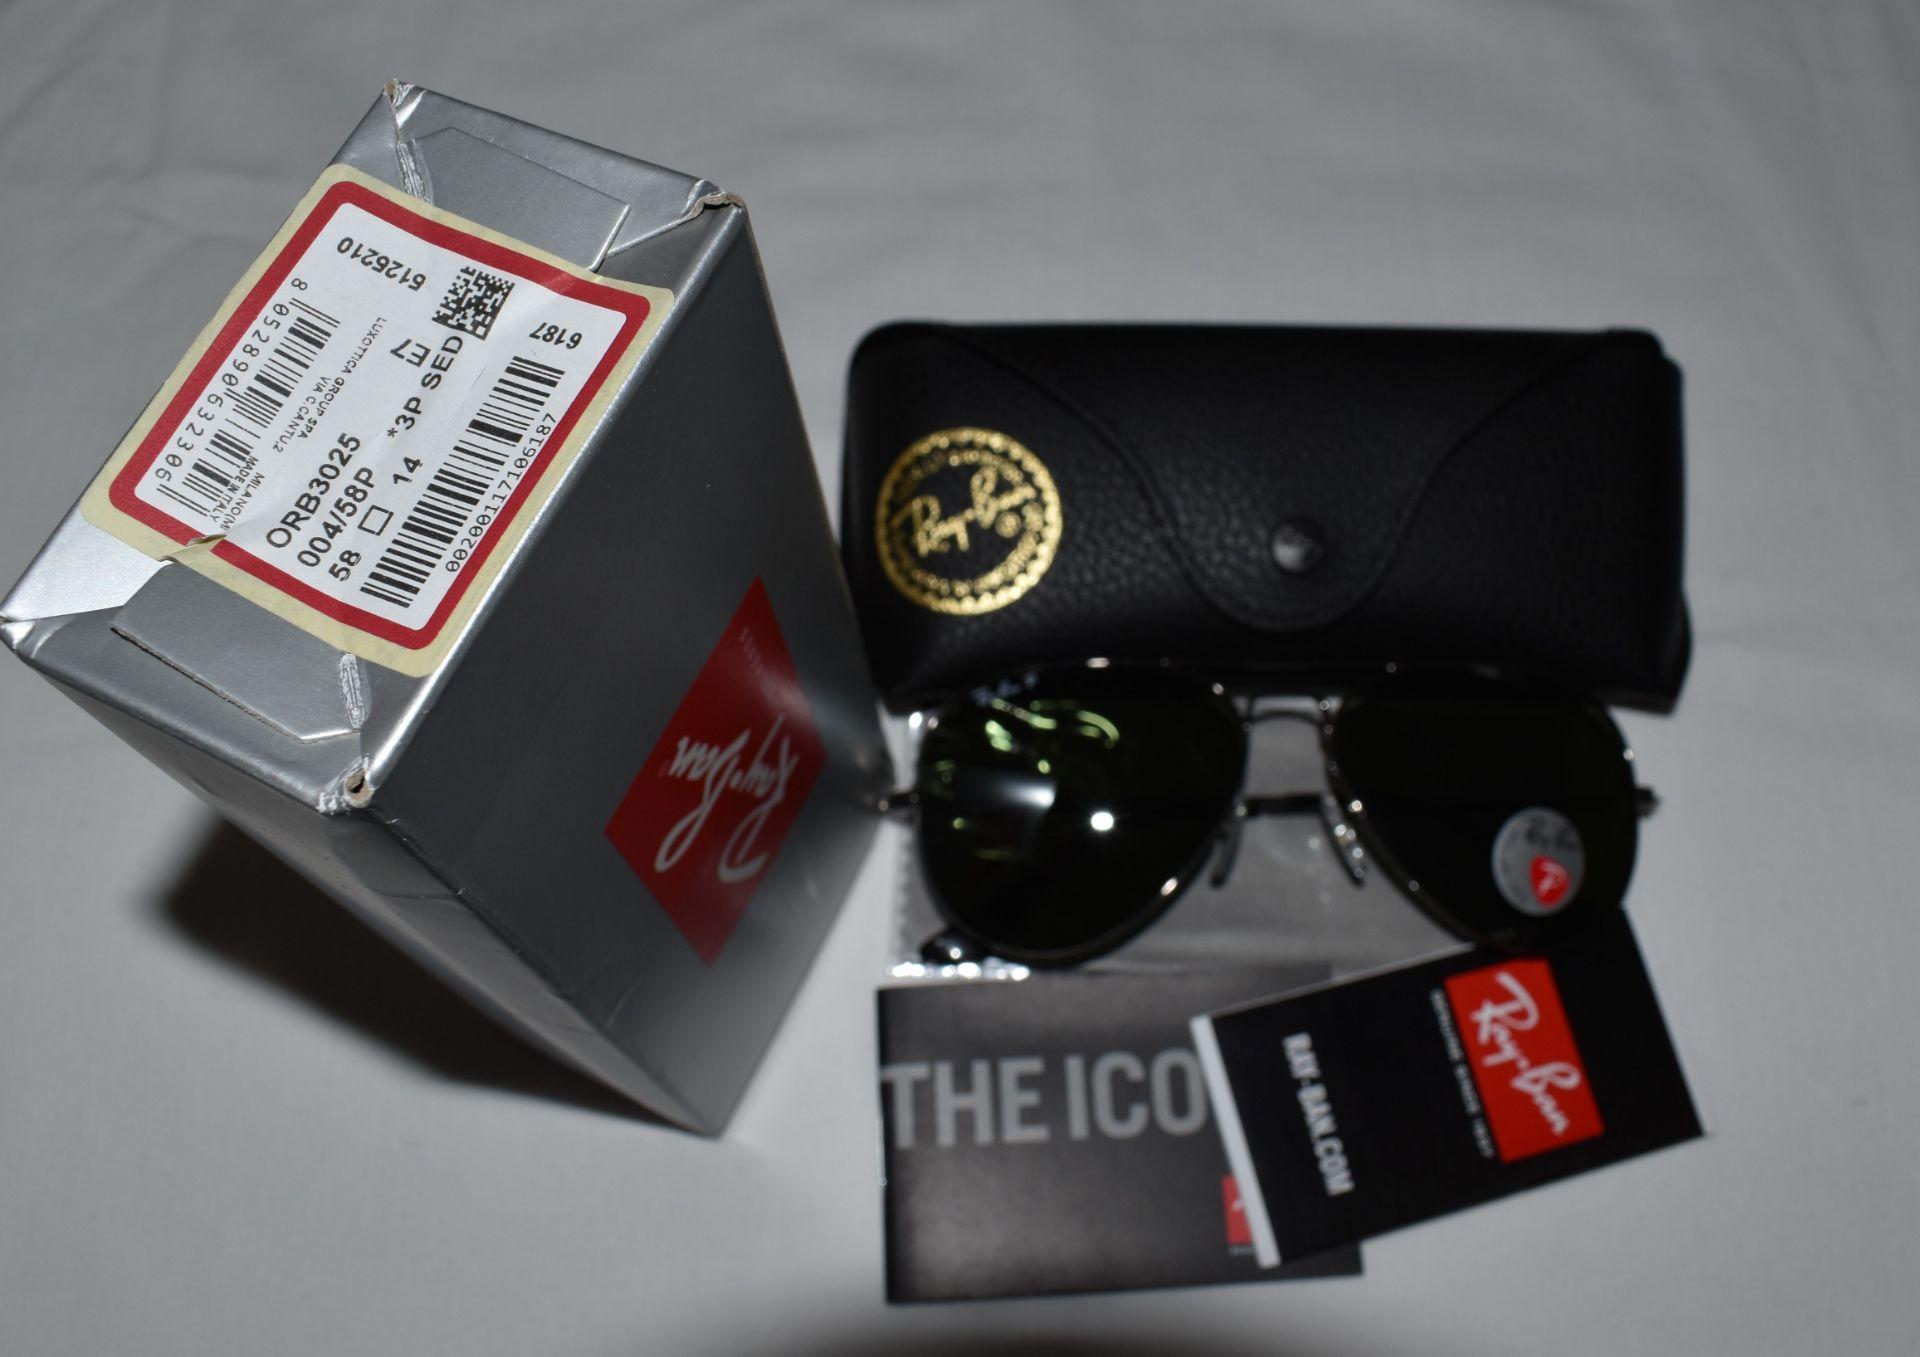 Ray Ban Sunglasses ORB3025 004/58 *3P - Image 2 of 2